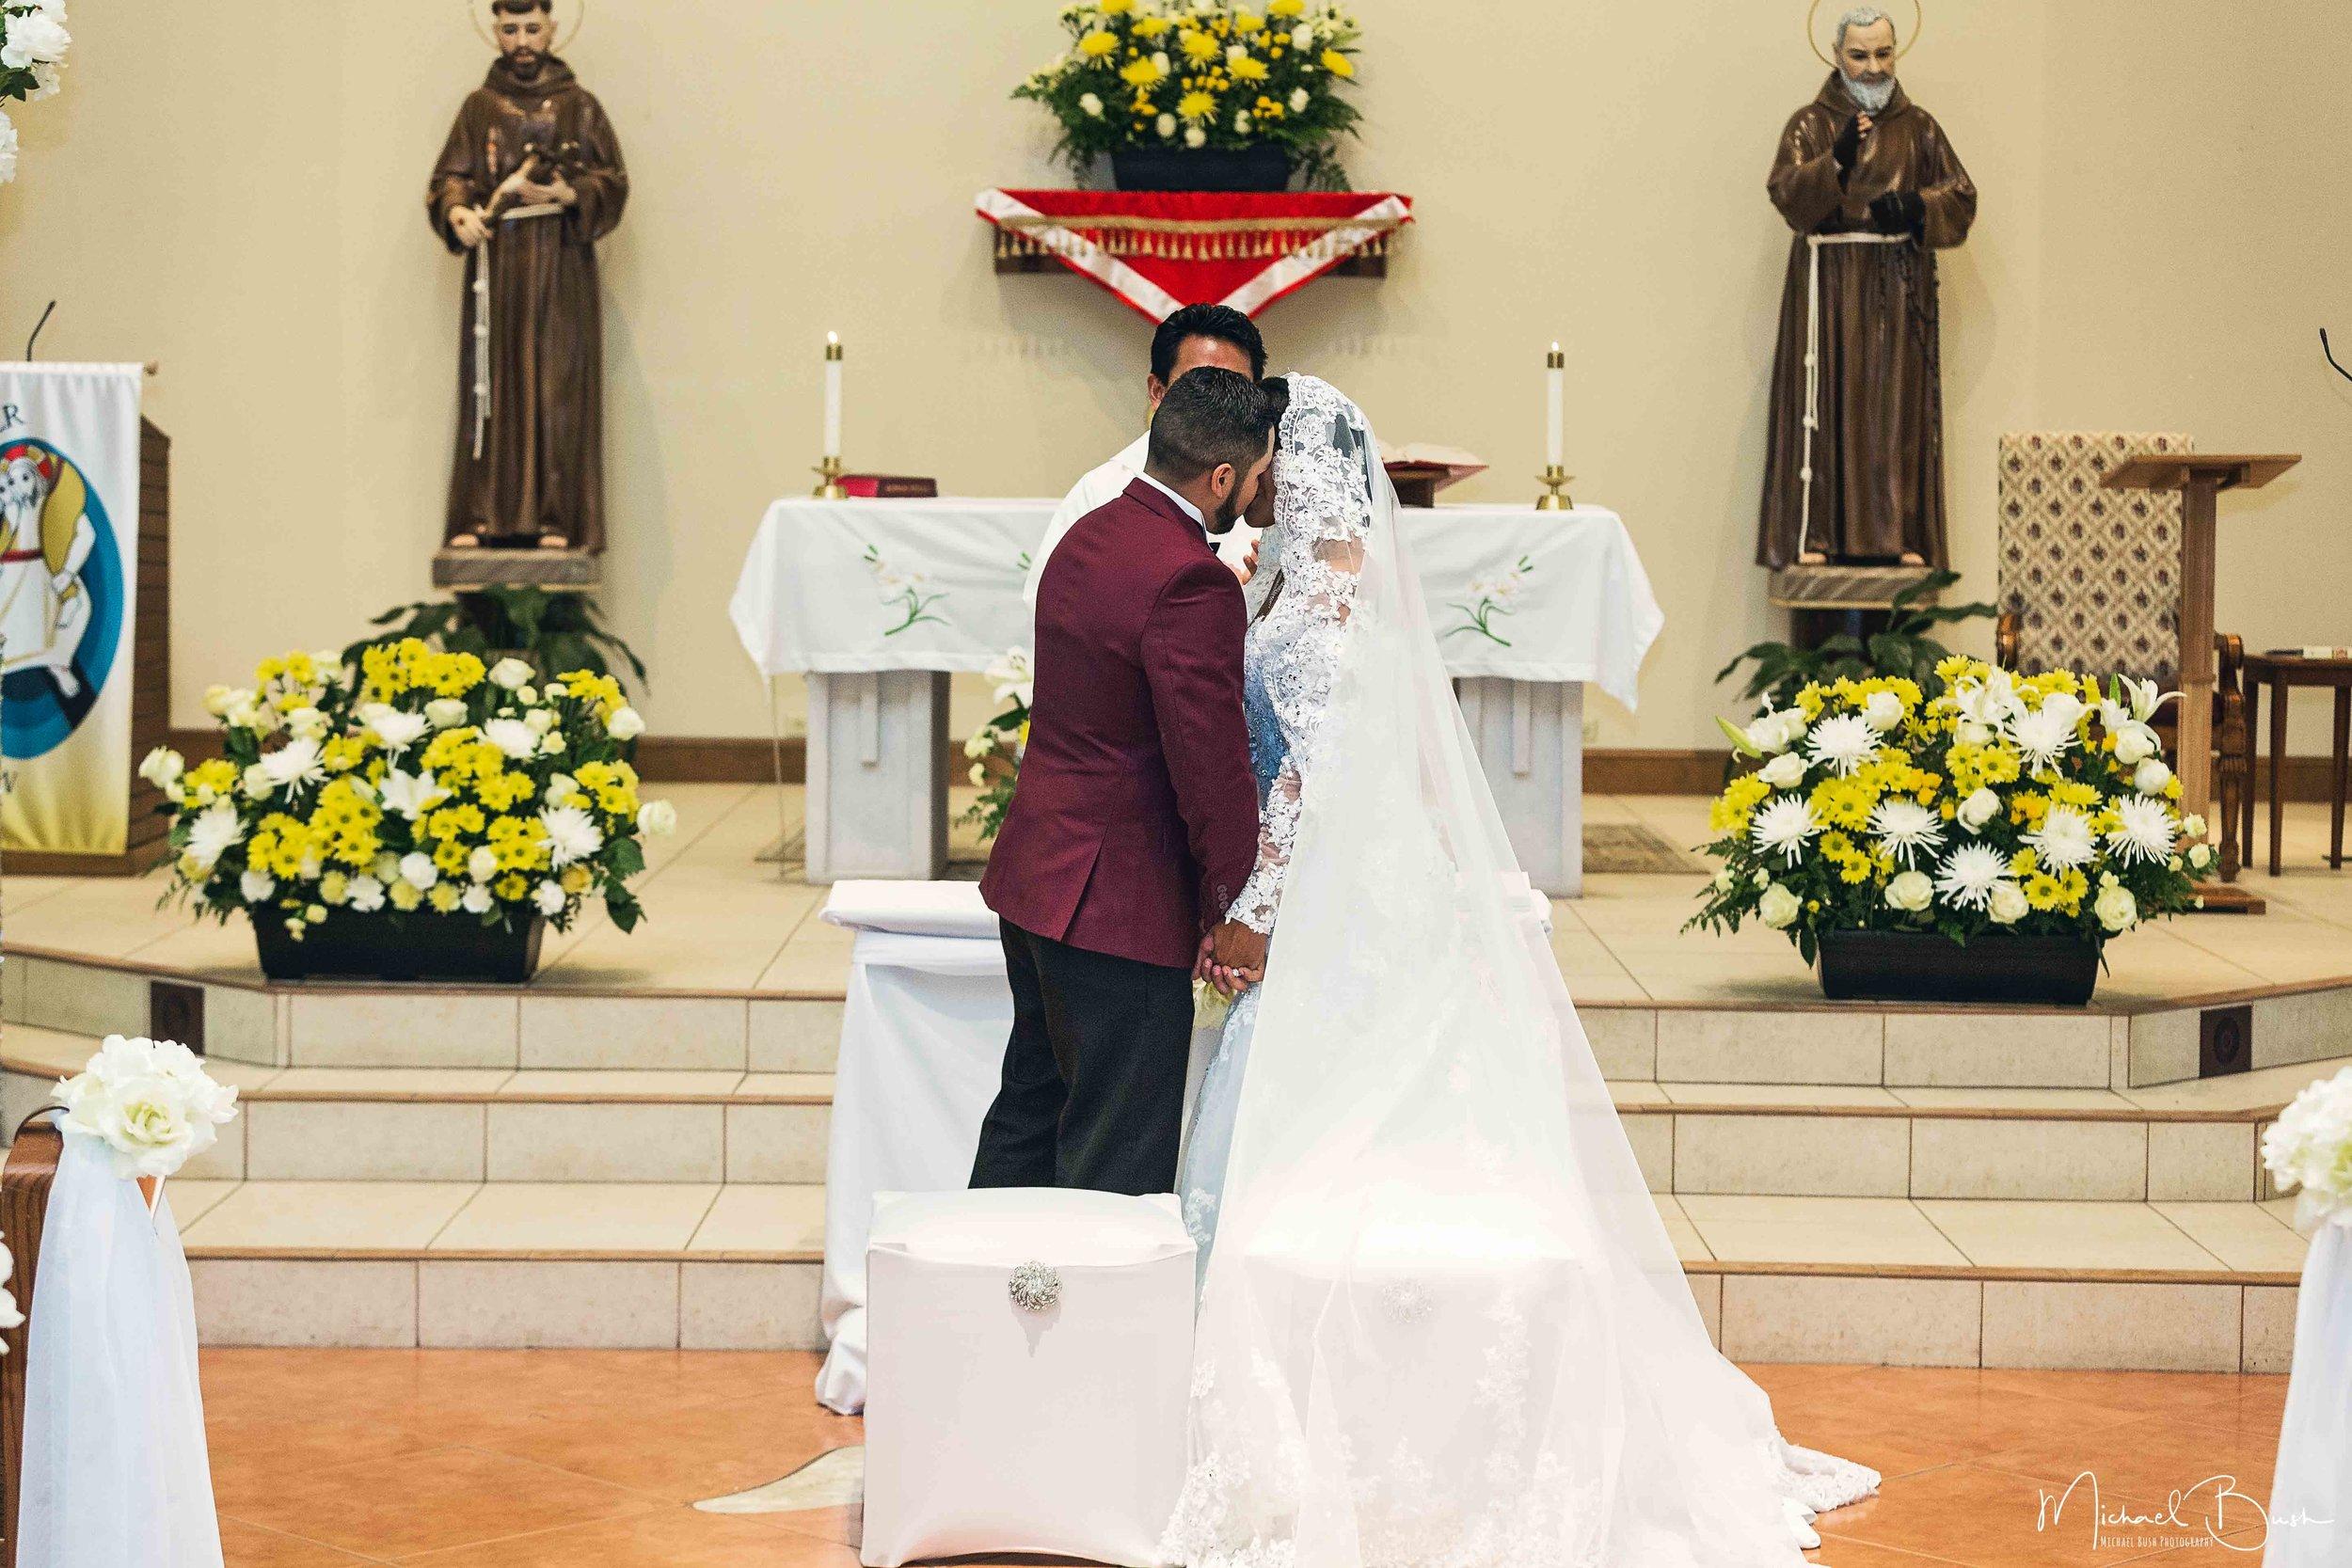 Wedding-Details-Bride-Fort Worth-colors-Ceremony-weddingceremony-brides-groom-ido-church-kiss-firstkiss.jpg